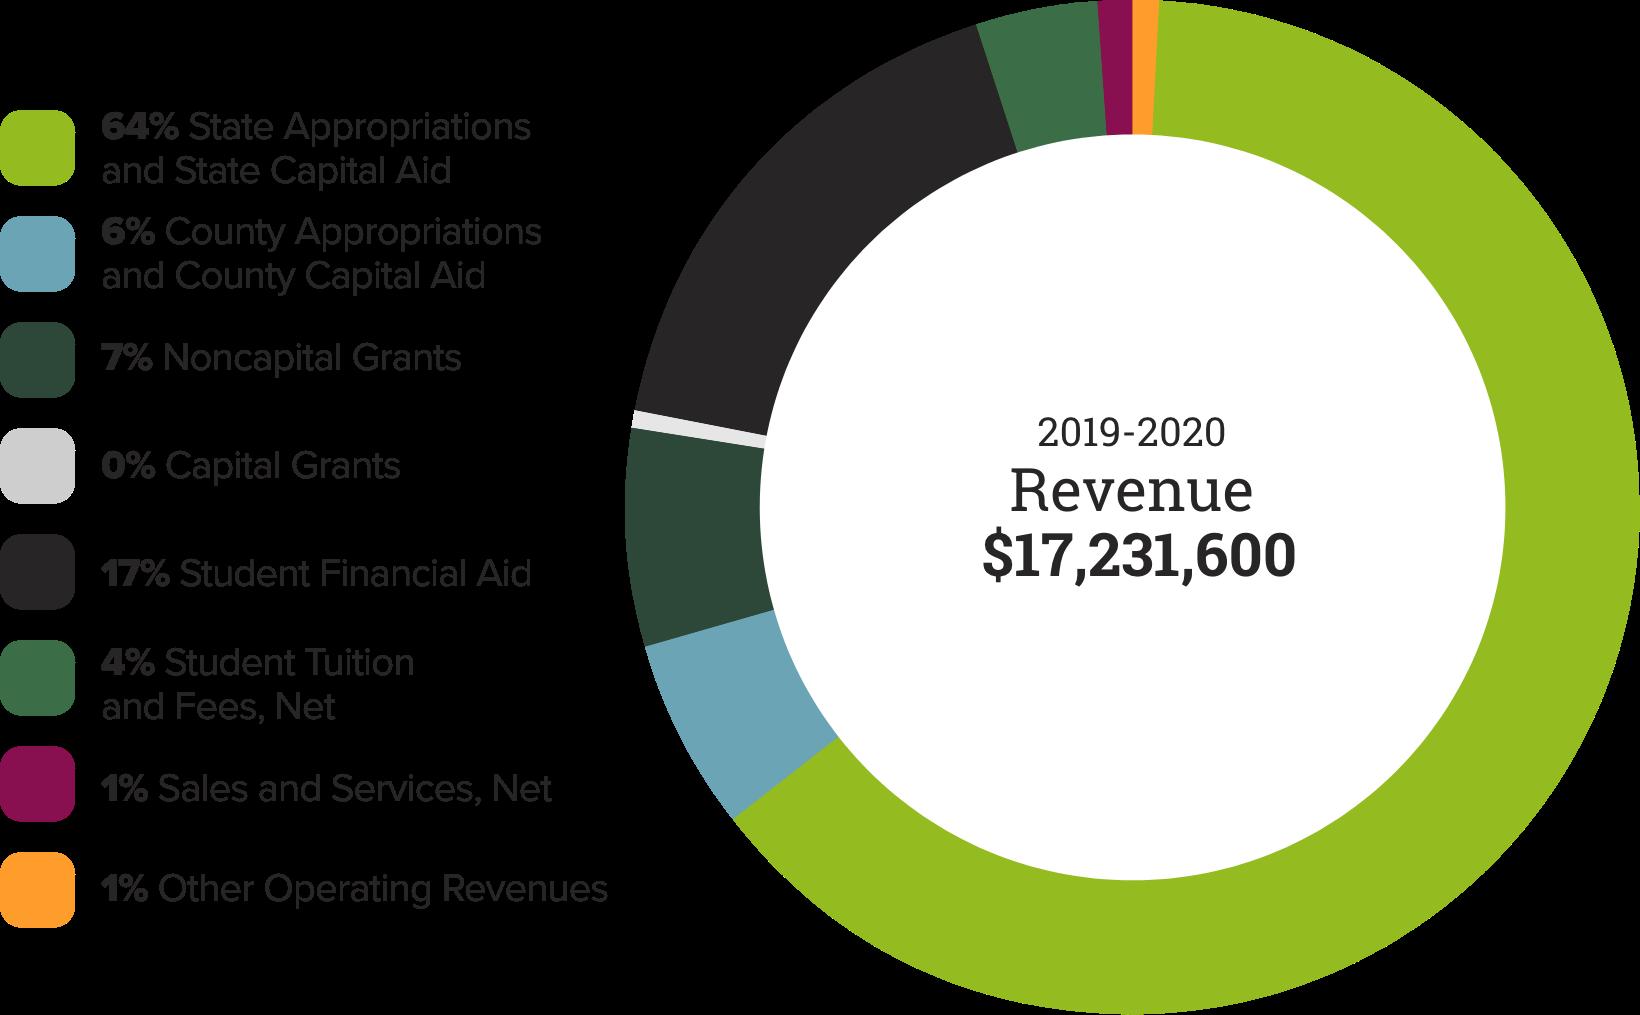 2020 Annual Report Revenue